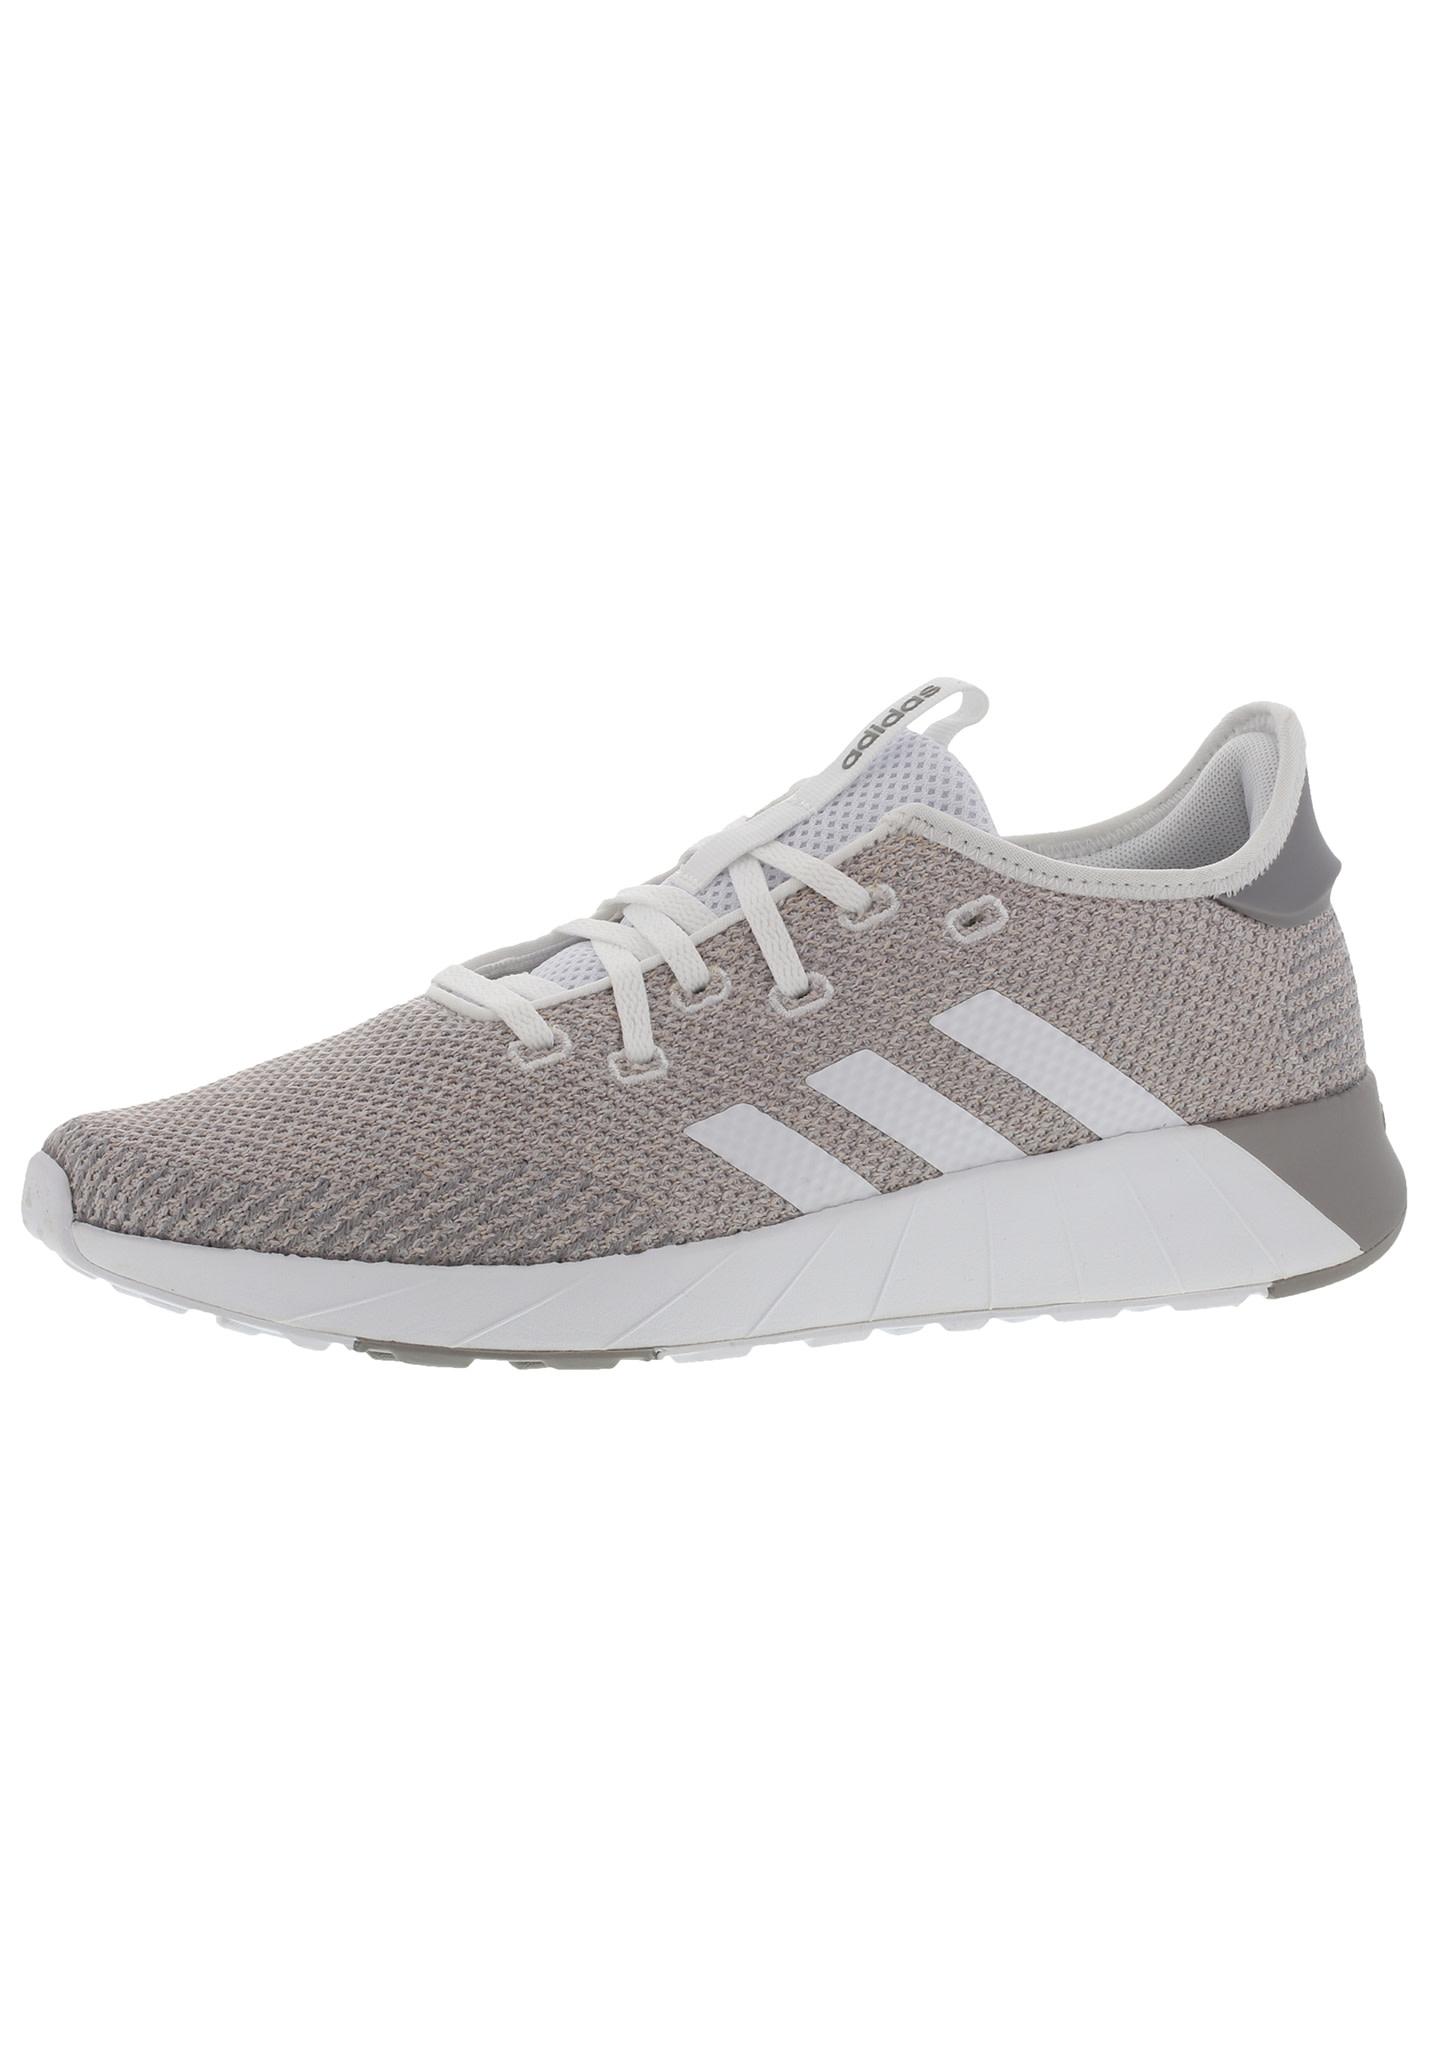 4374342a796 adidas Questar X Byd - Running shoes for Women - Grey